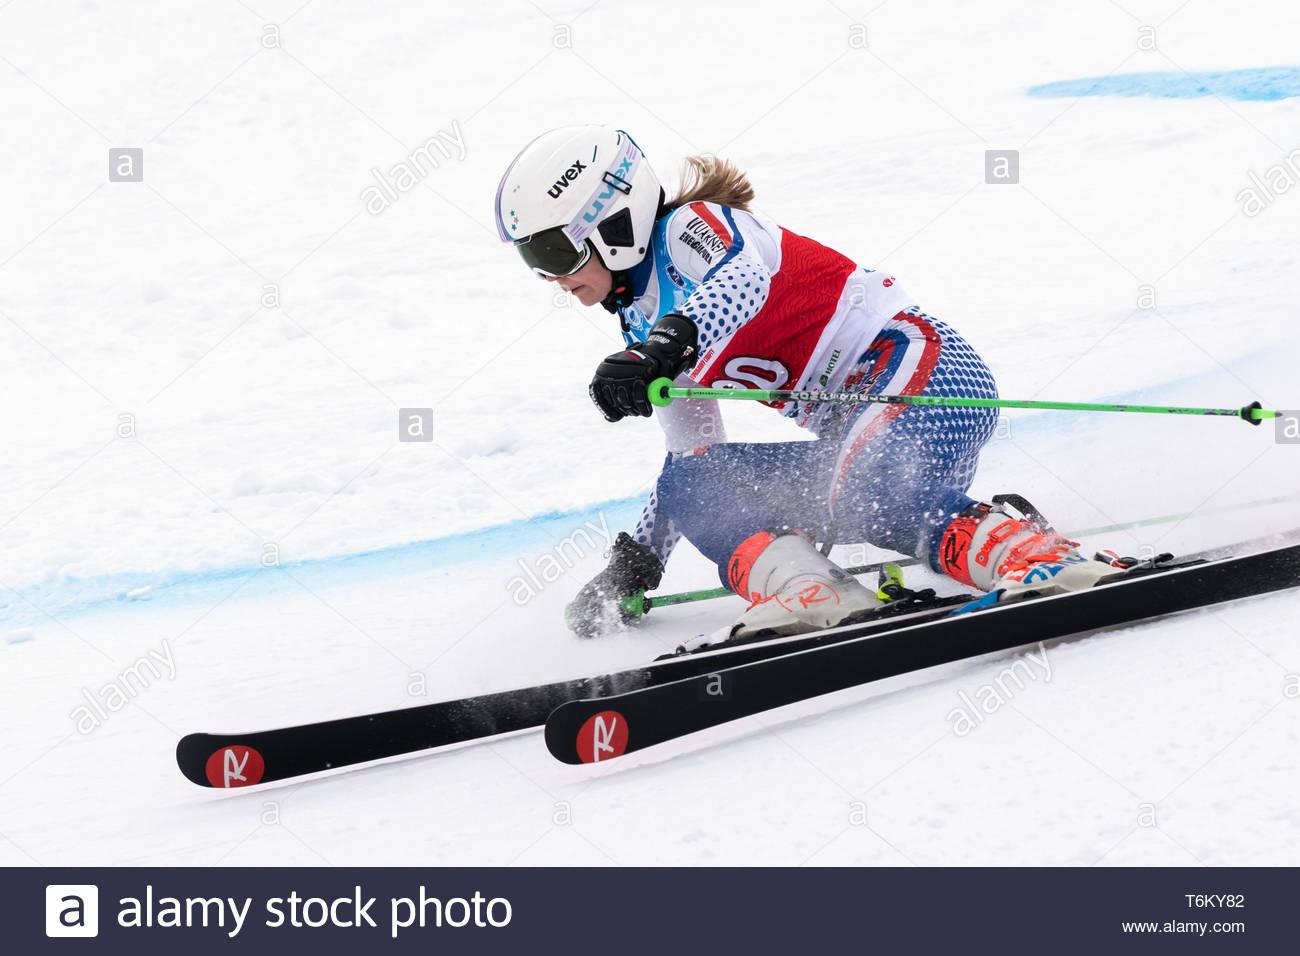 KAMCHATKA PENINSULA, RUSSIA - APR 2, 2019: Mountain skier Anastasia Shubina (Krasnoyarsk) skiing down mount. International Ski Federation, Championshi - Stock Image